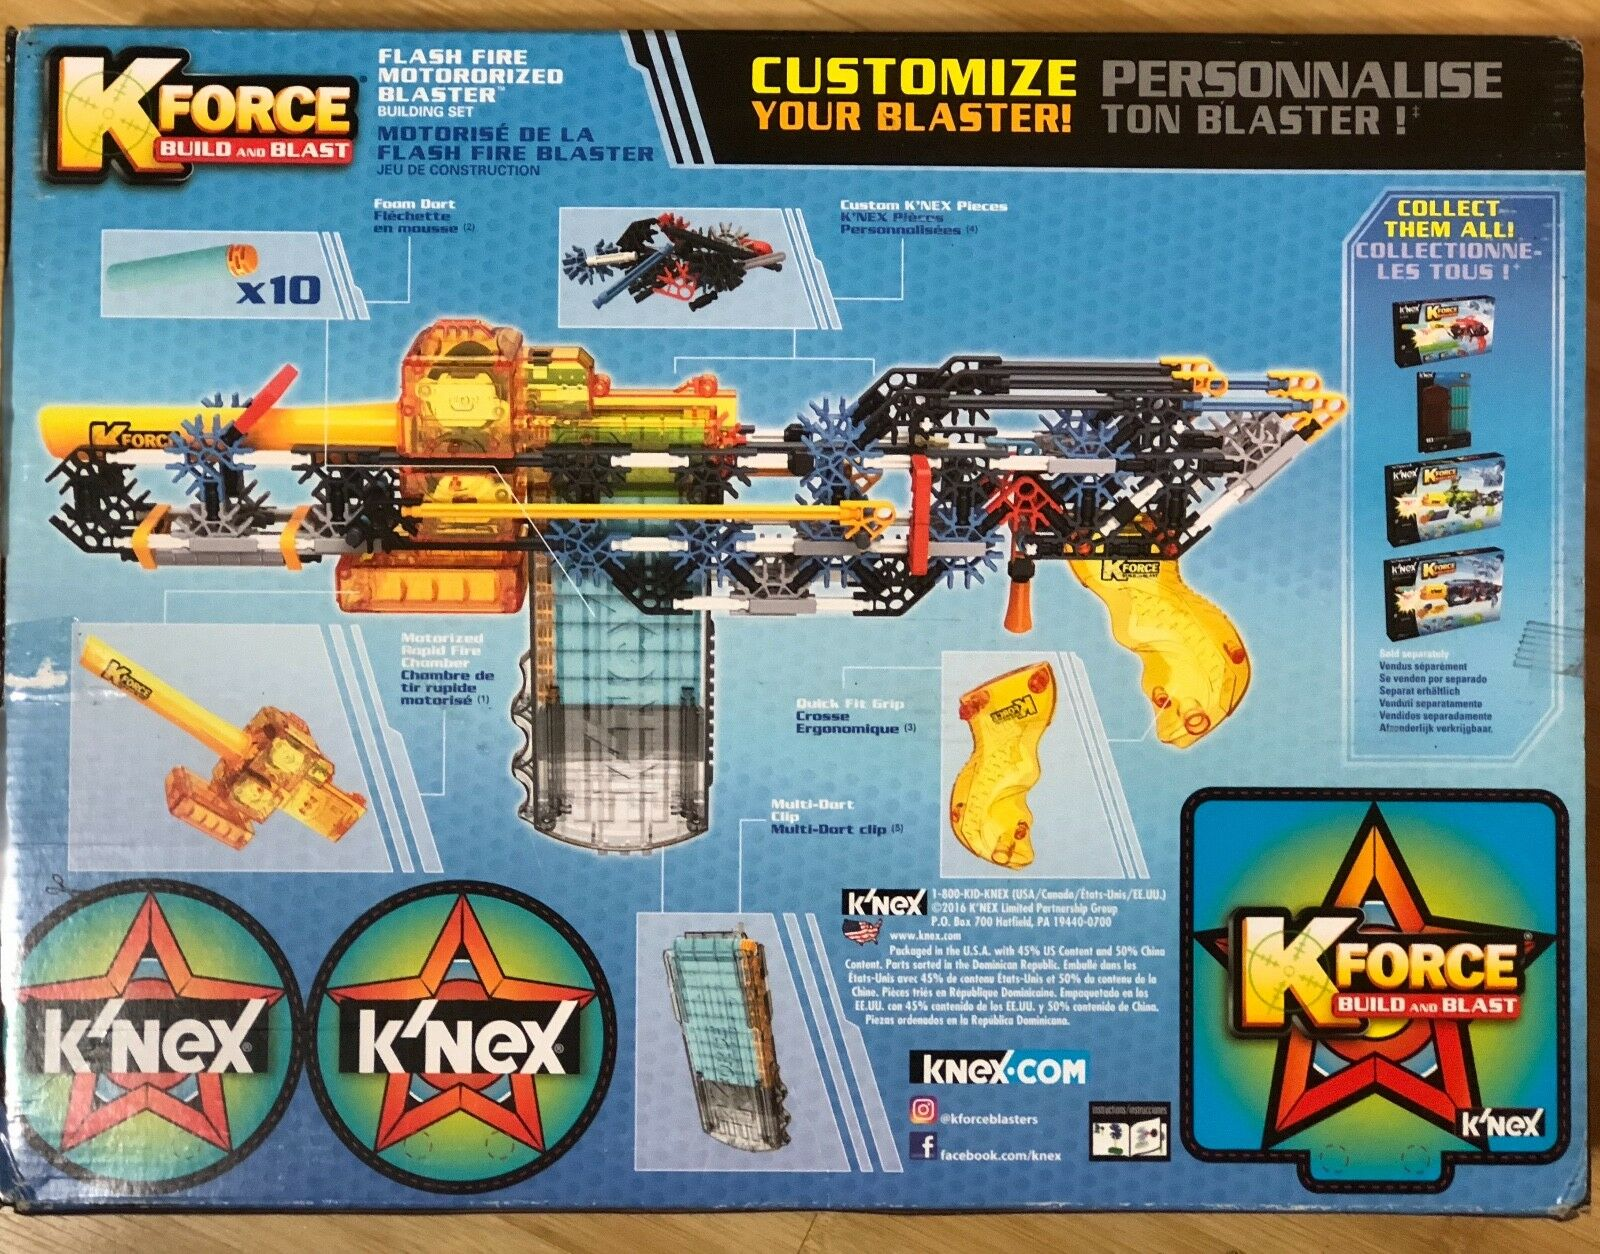 K'NEX K-Force  Flash Fire Motorized Blaster Building Set  288 Pieces  For Age 8+